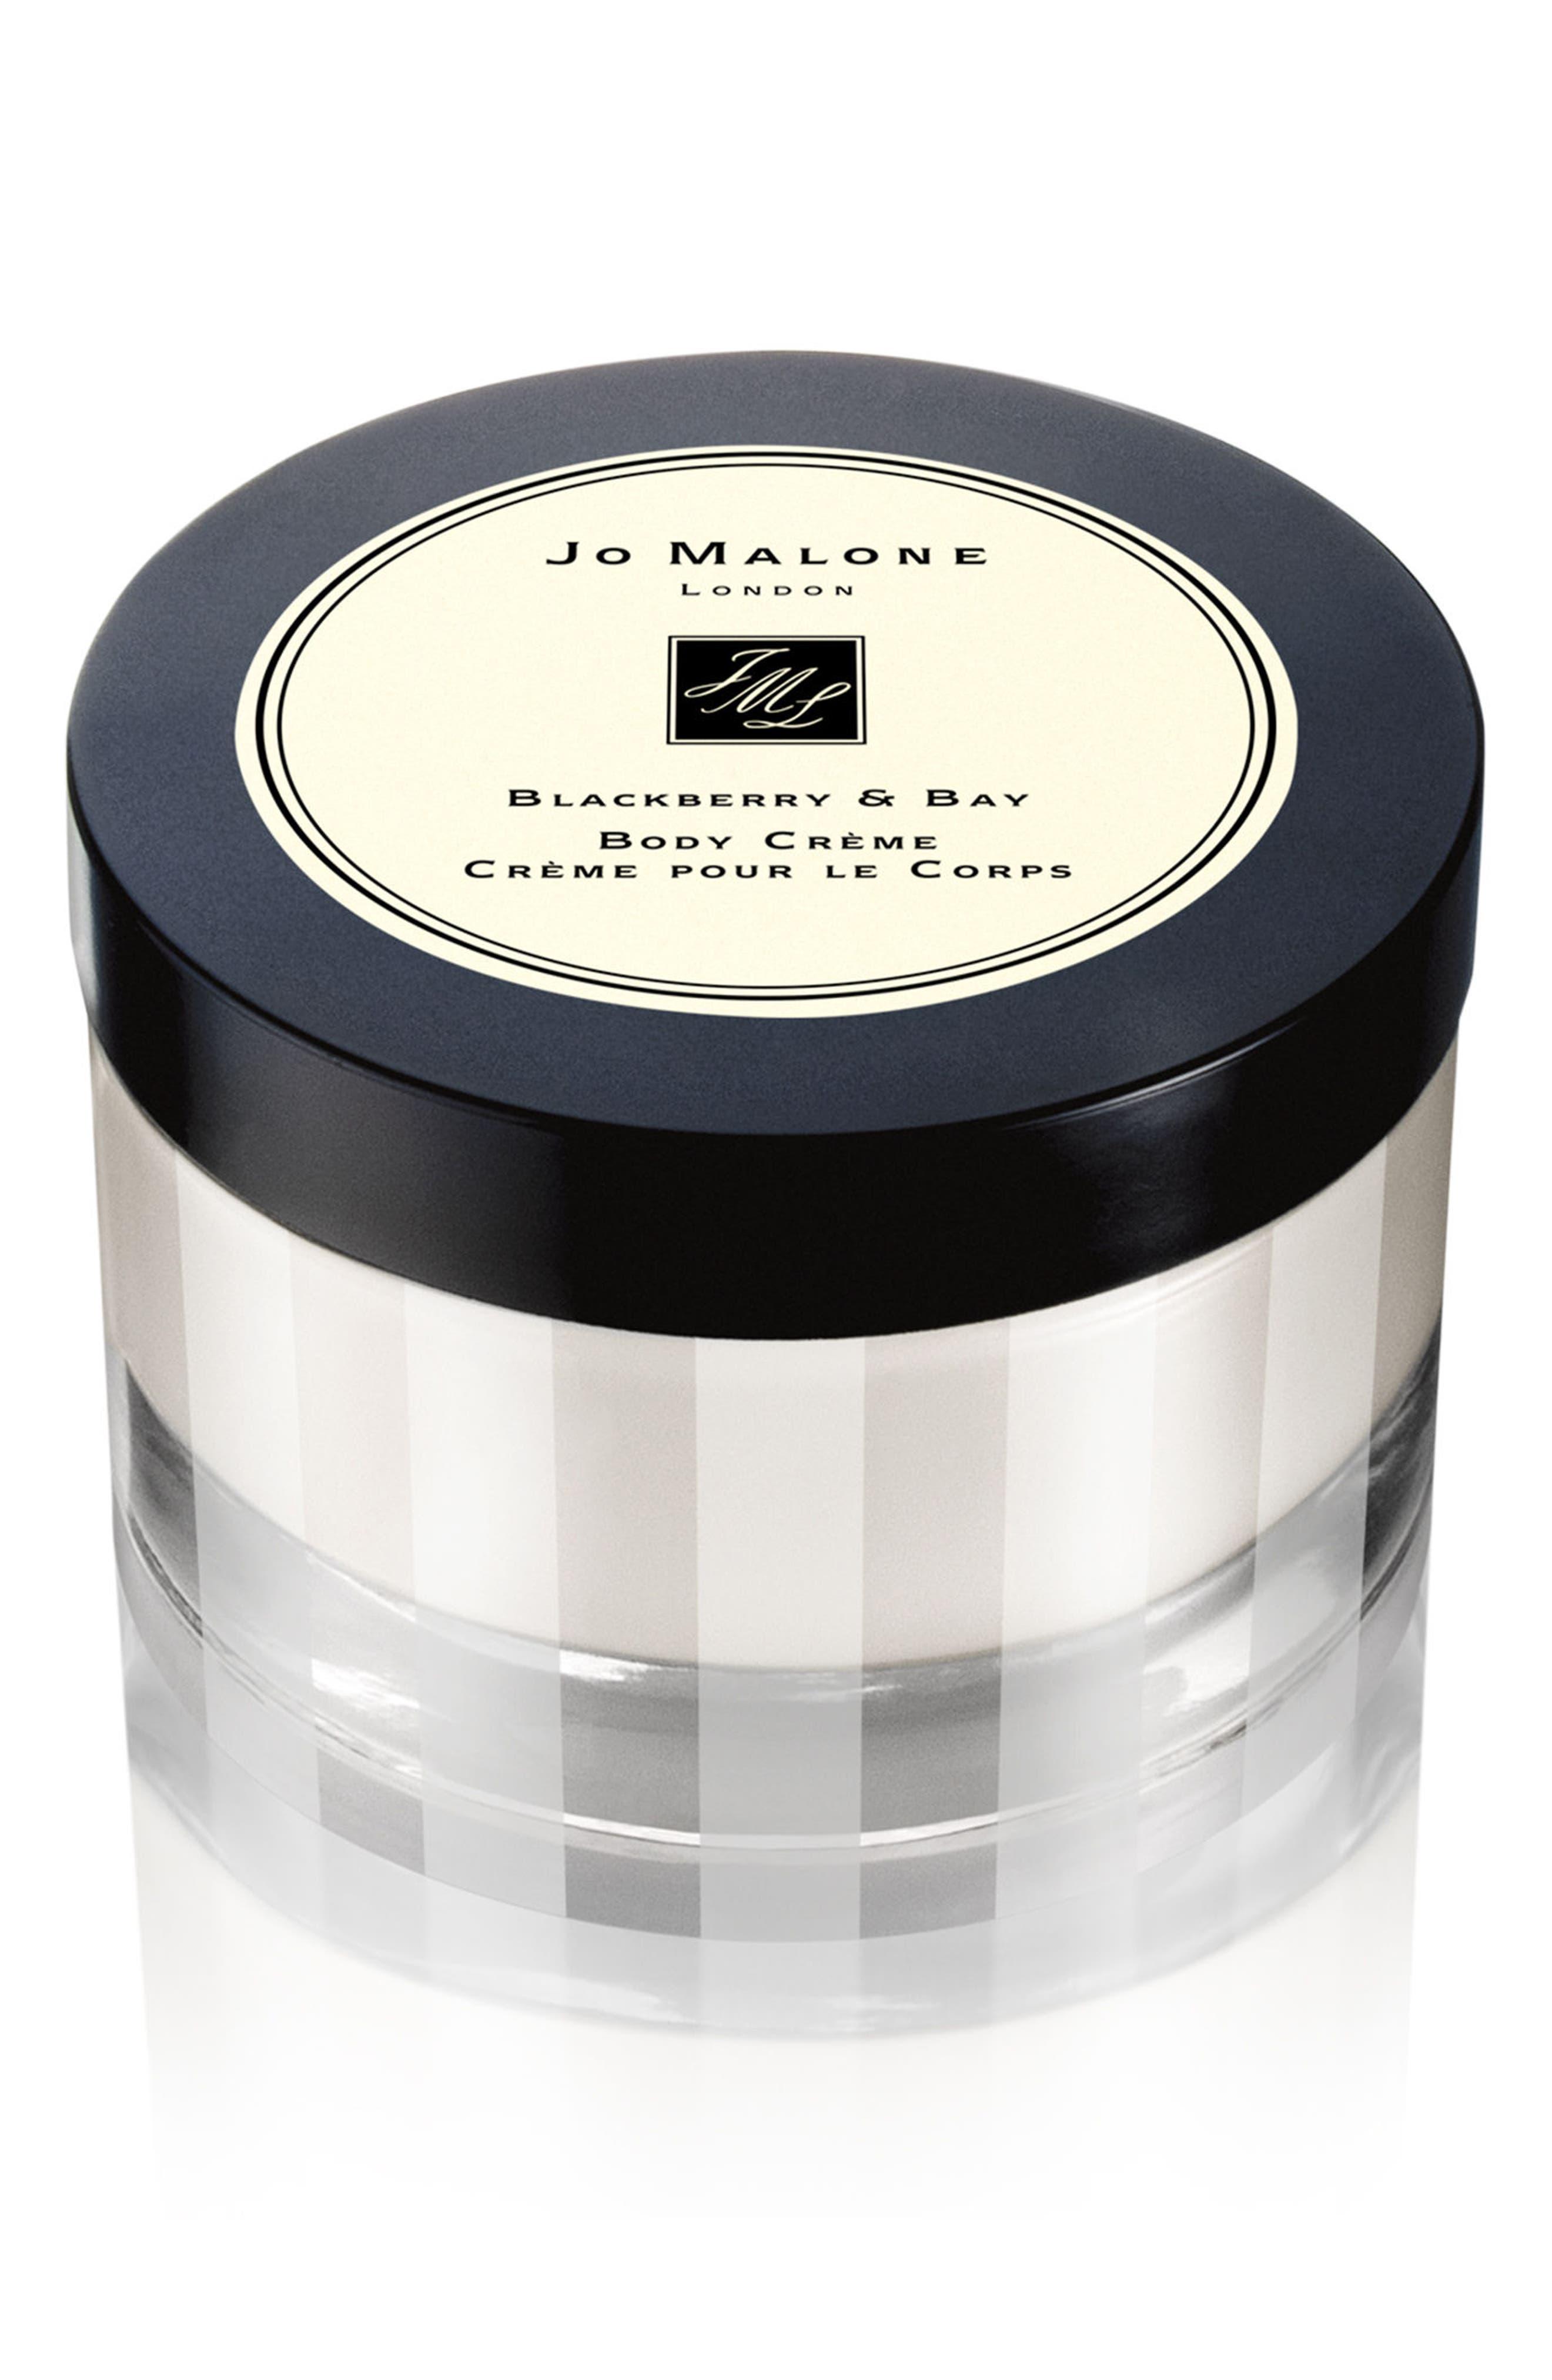 Jo Malone London™ 'Blackberry & Bay' Body Crème